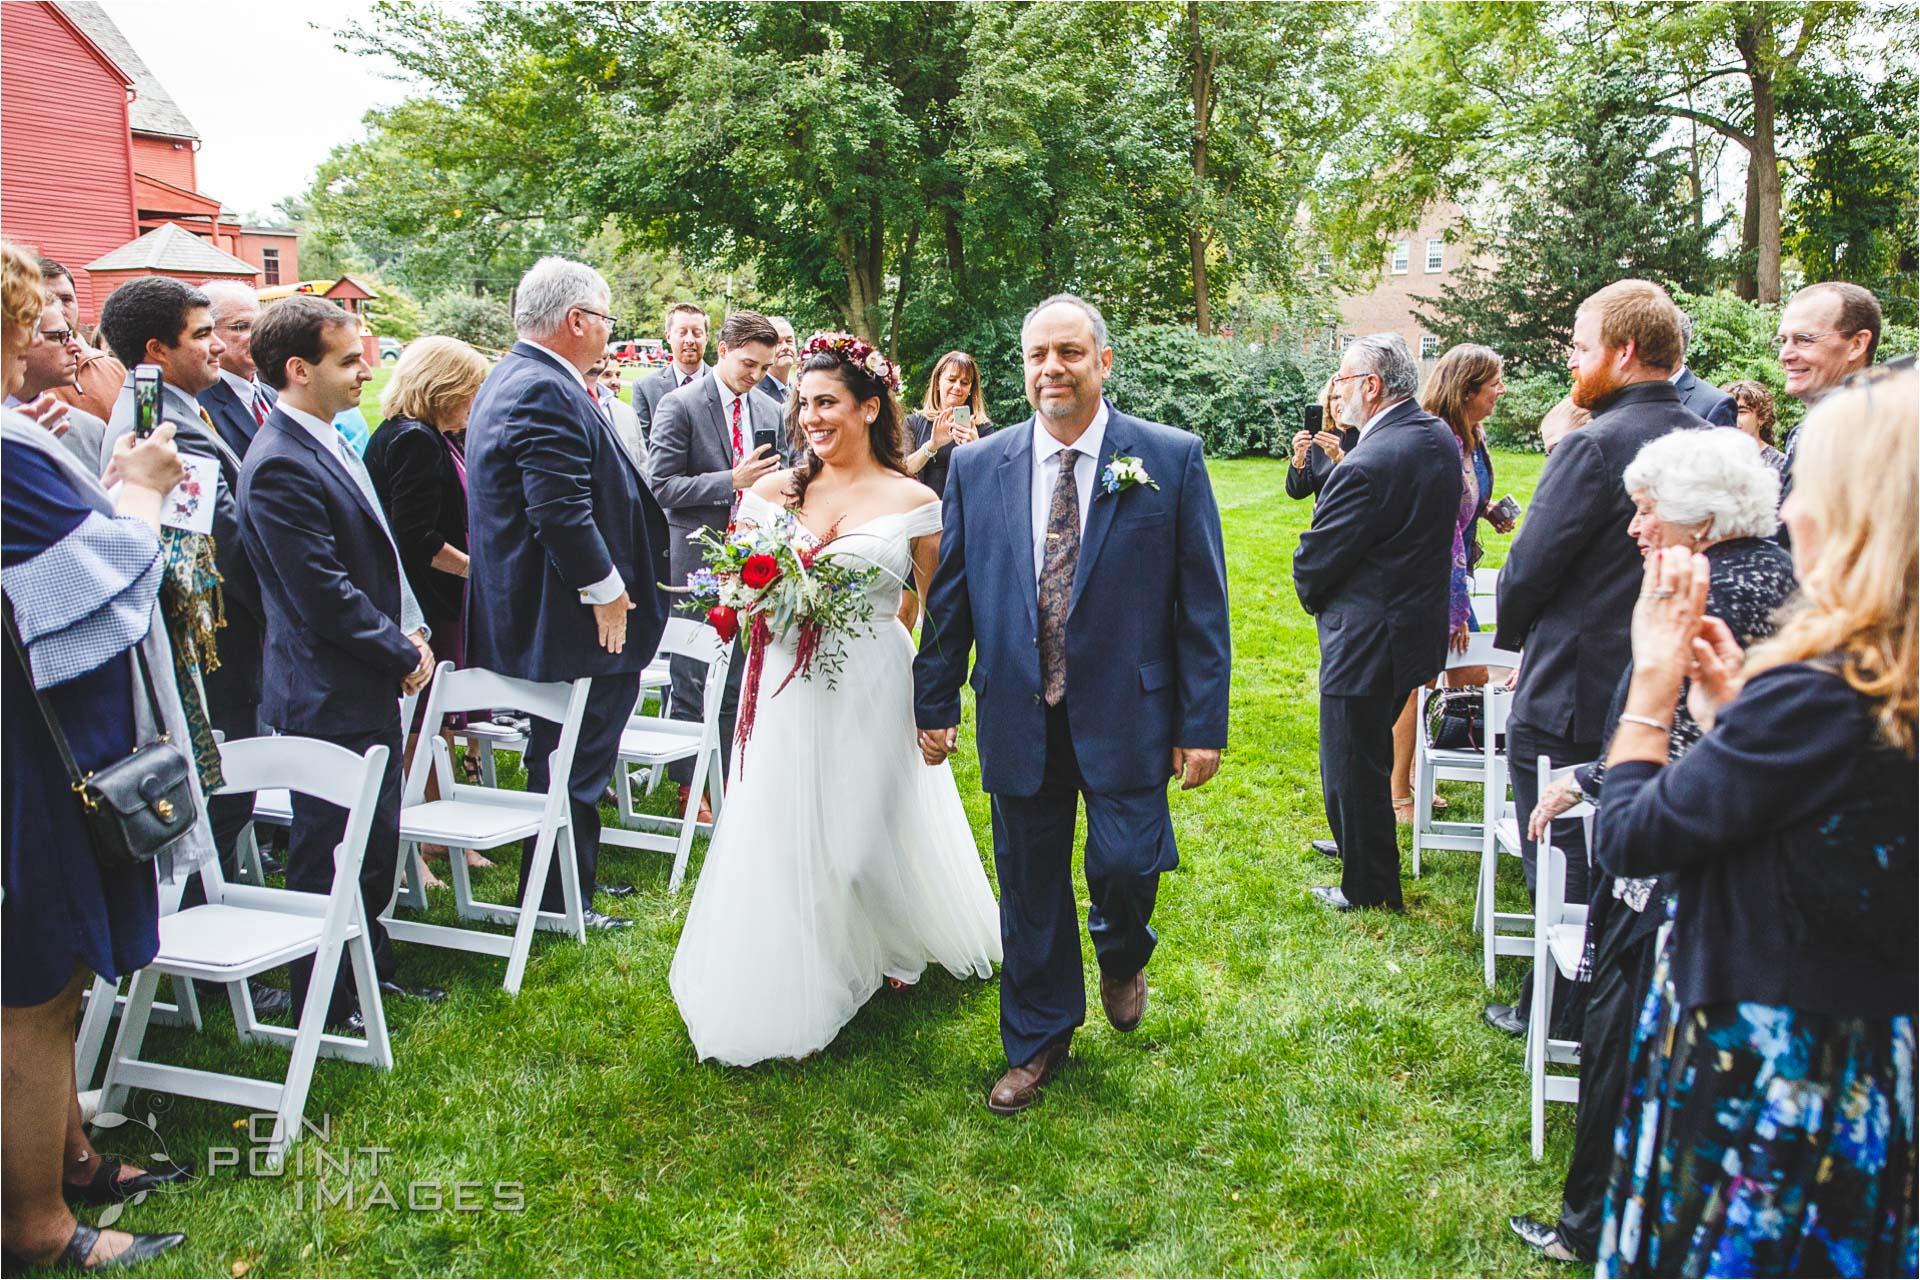 webb-barn-wedding-photography-silas-robbins-house-09.jpg